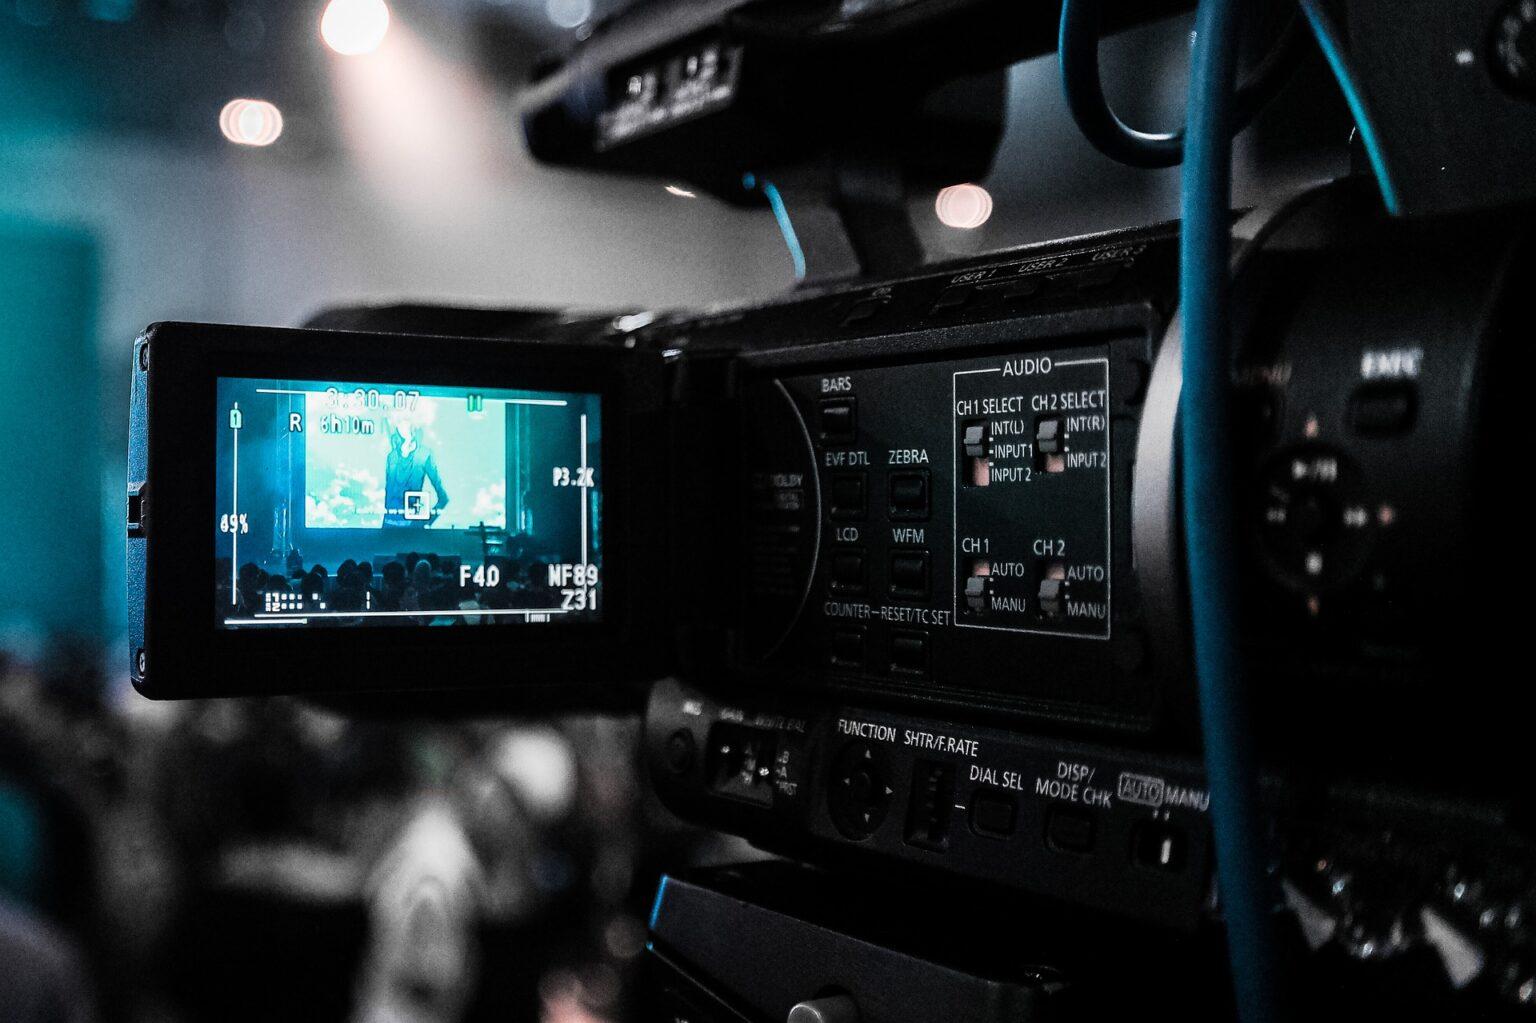 produkcija video sadržaja